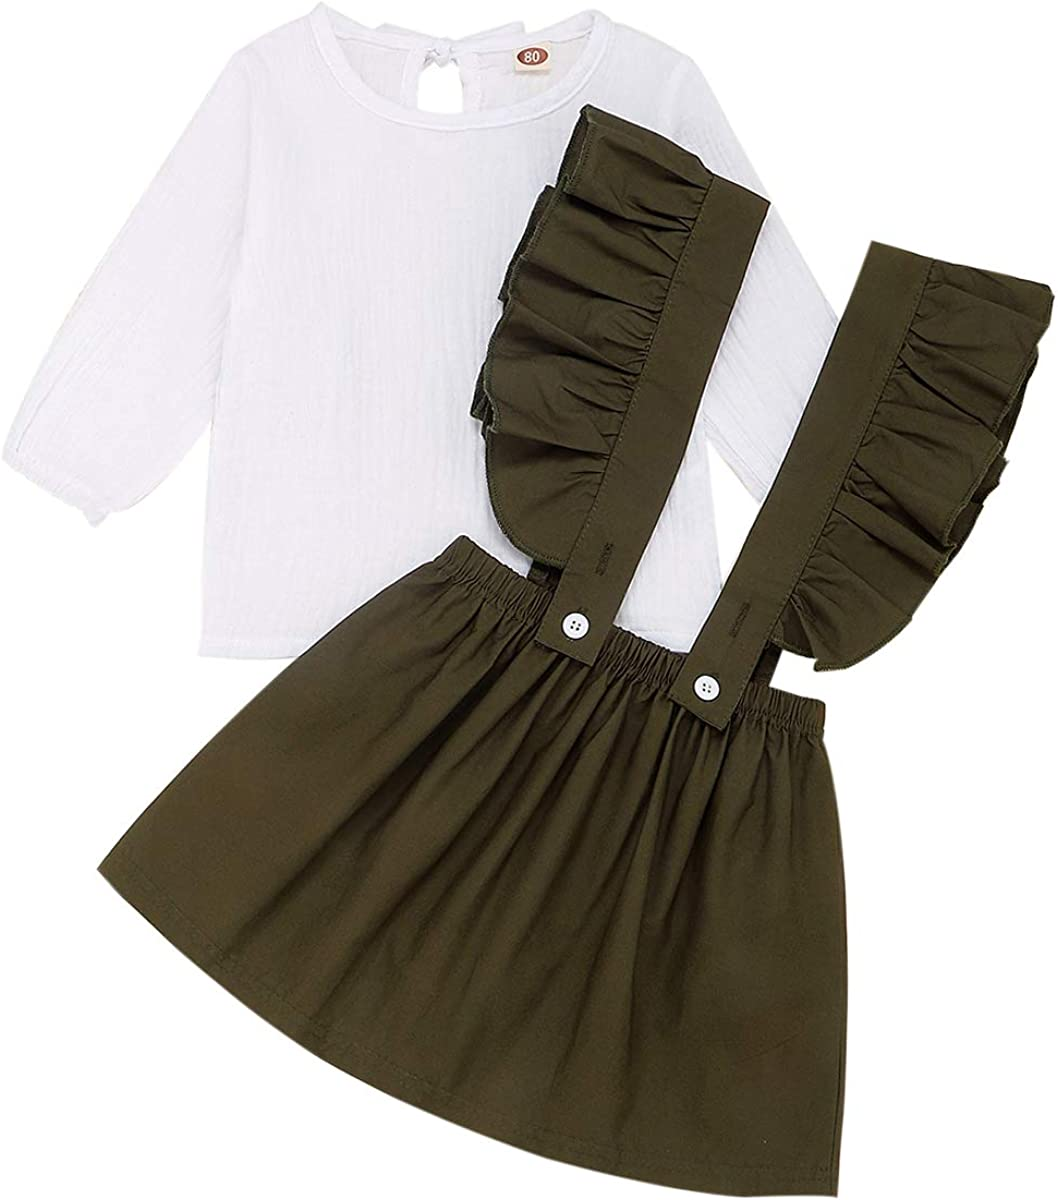 MTSLYH 幼児 赤ちゃん 女の子 コットンリネンシャツ+フリルサスペンダースカート オーバーオール アウトフィットセット